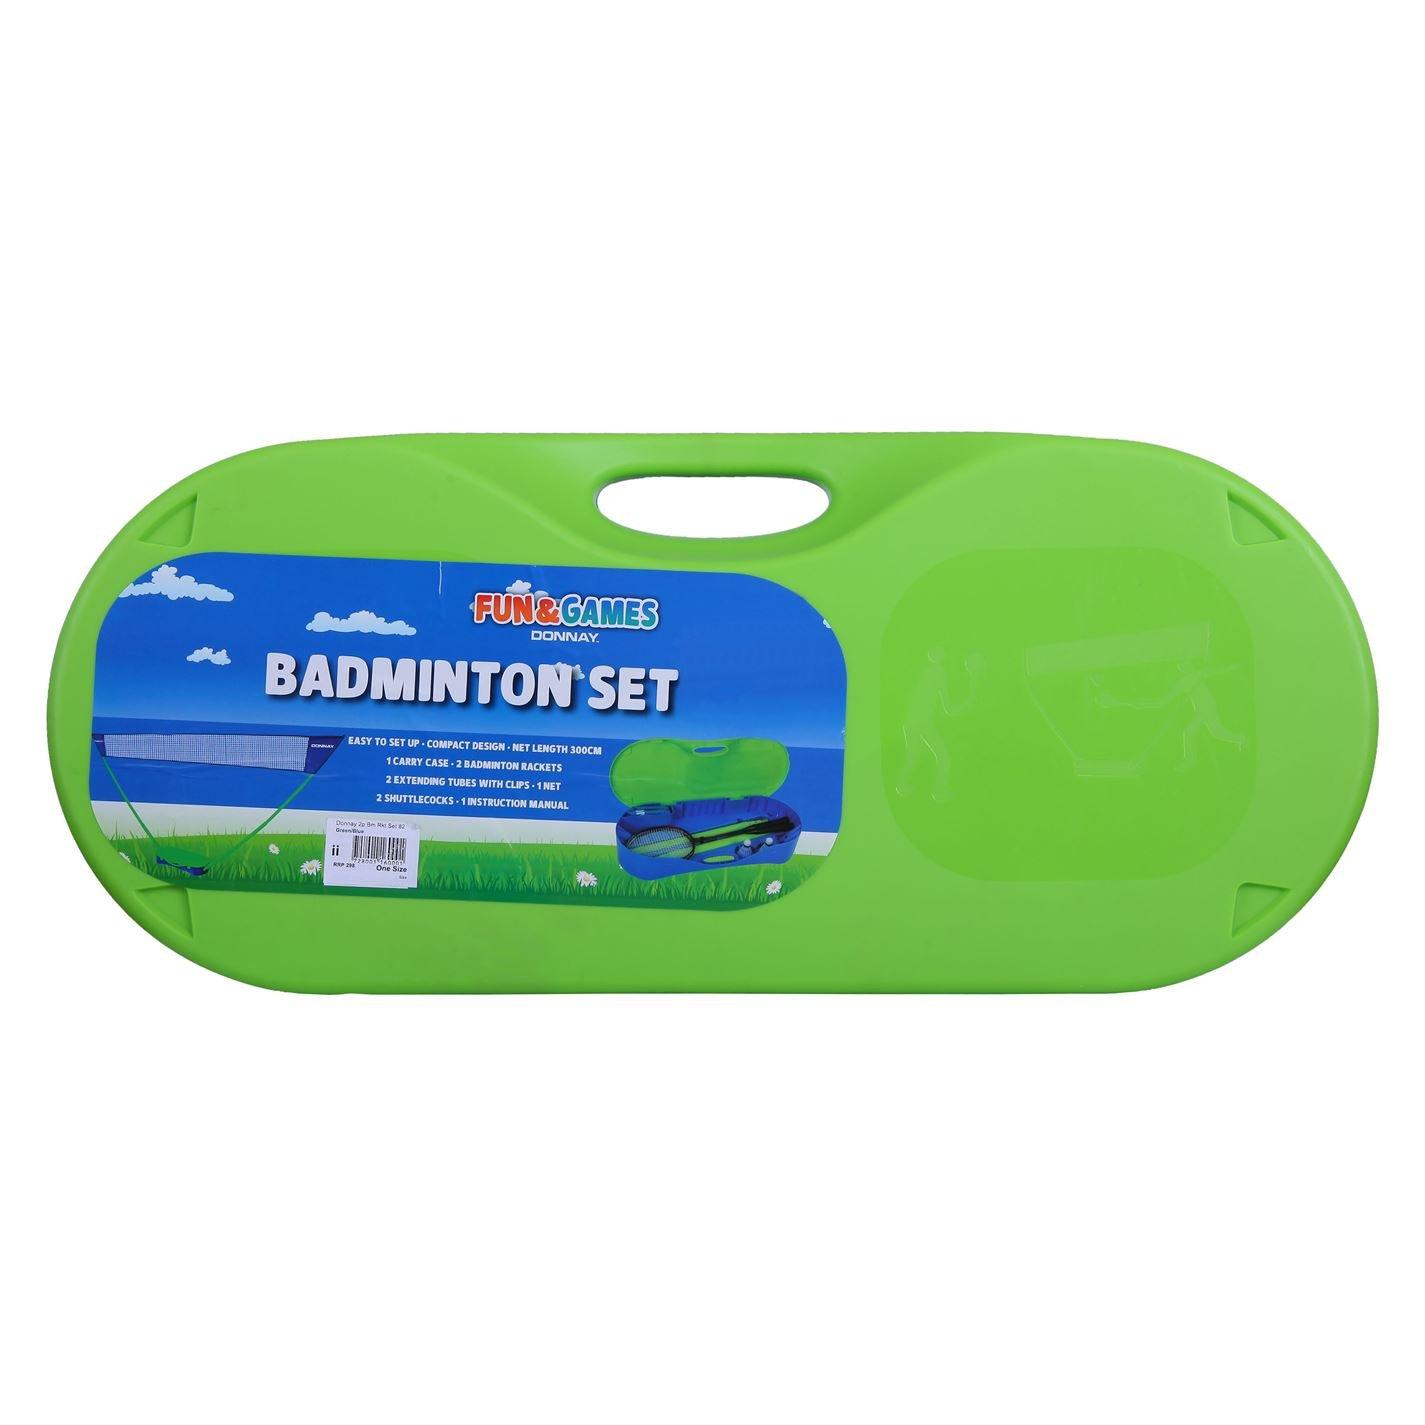 Donnay Unisex Badminton Set Amazon Sports Outdoors